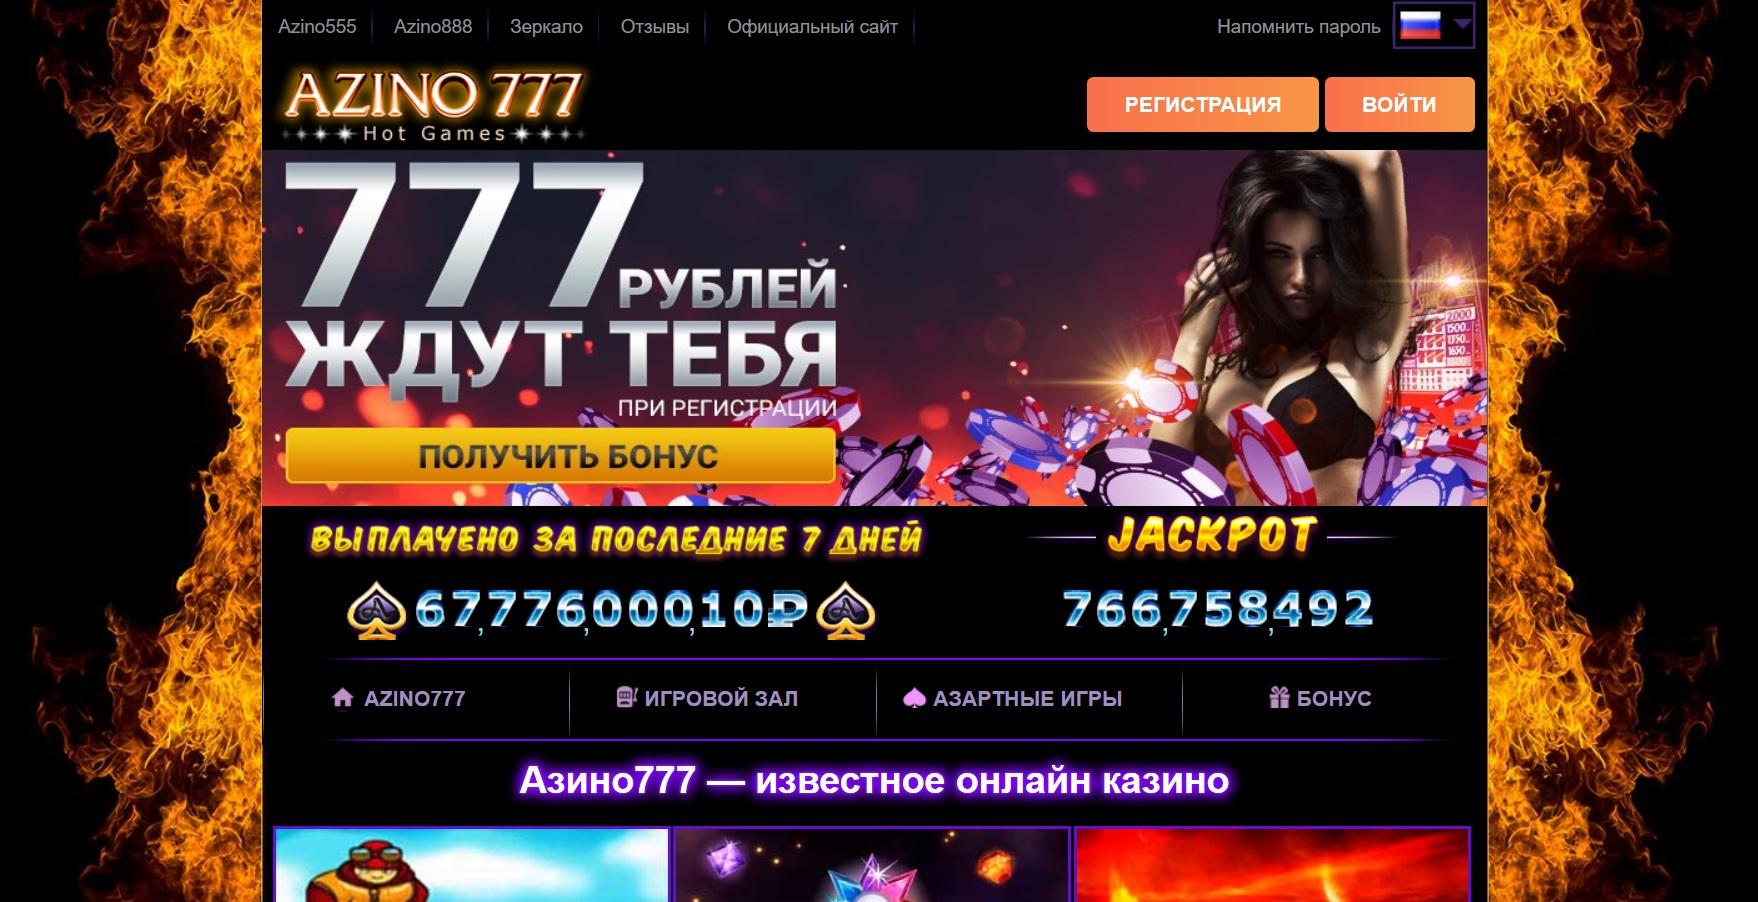 azino888 777 555